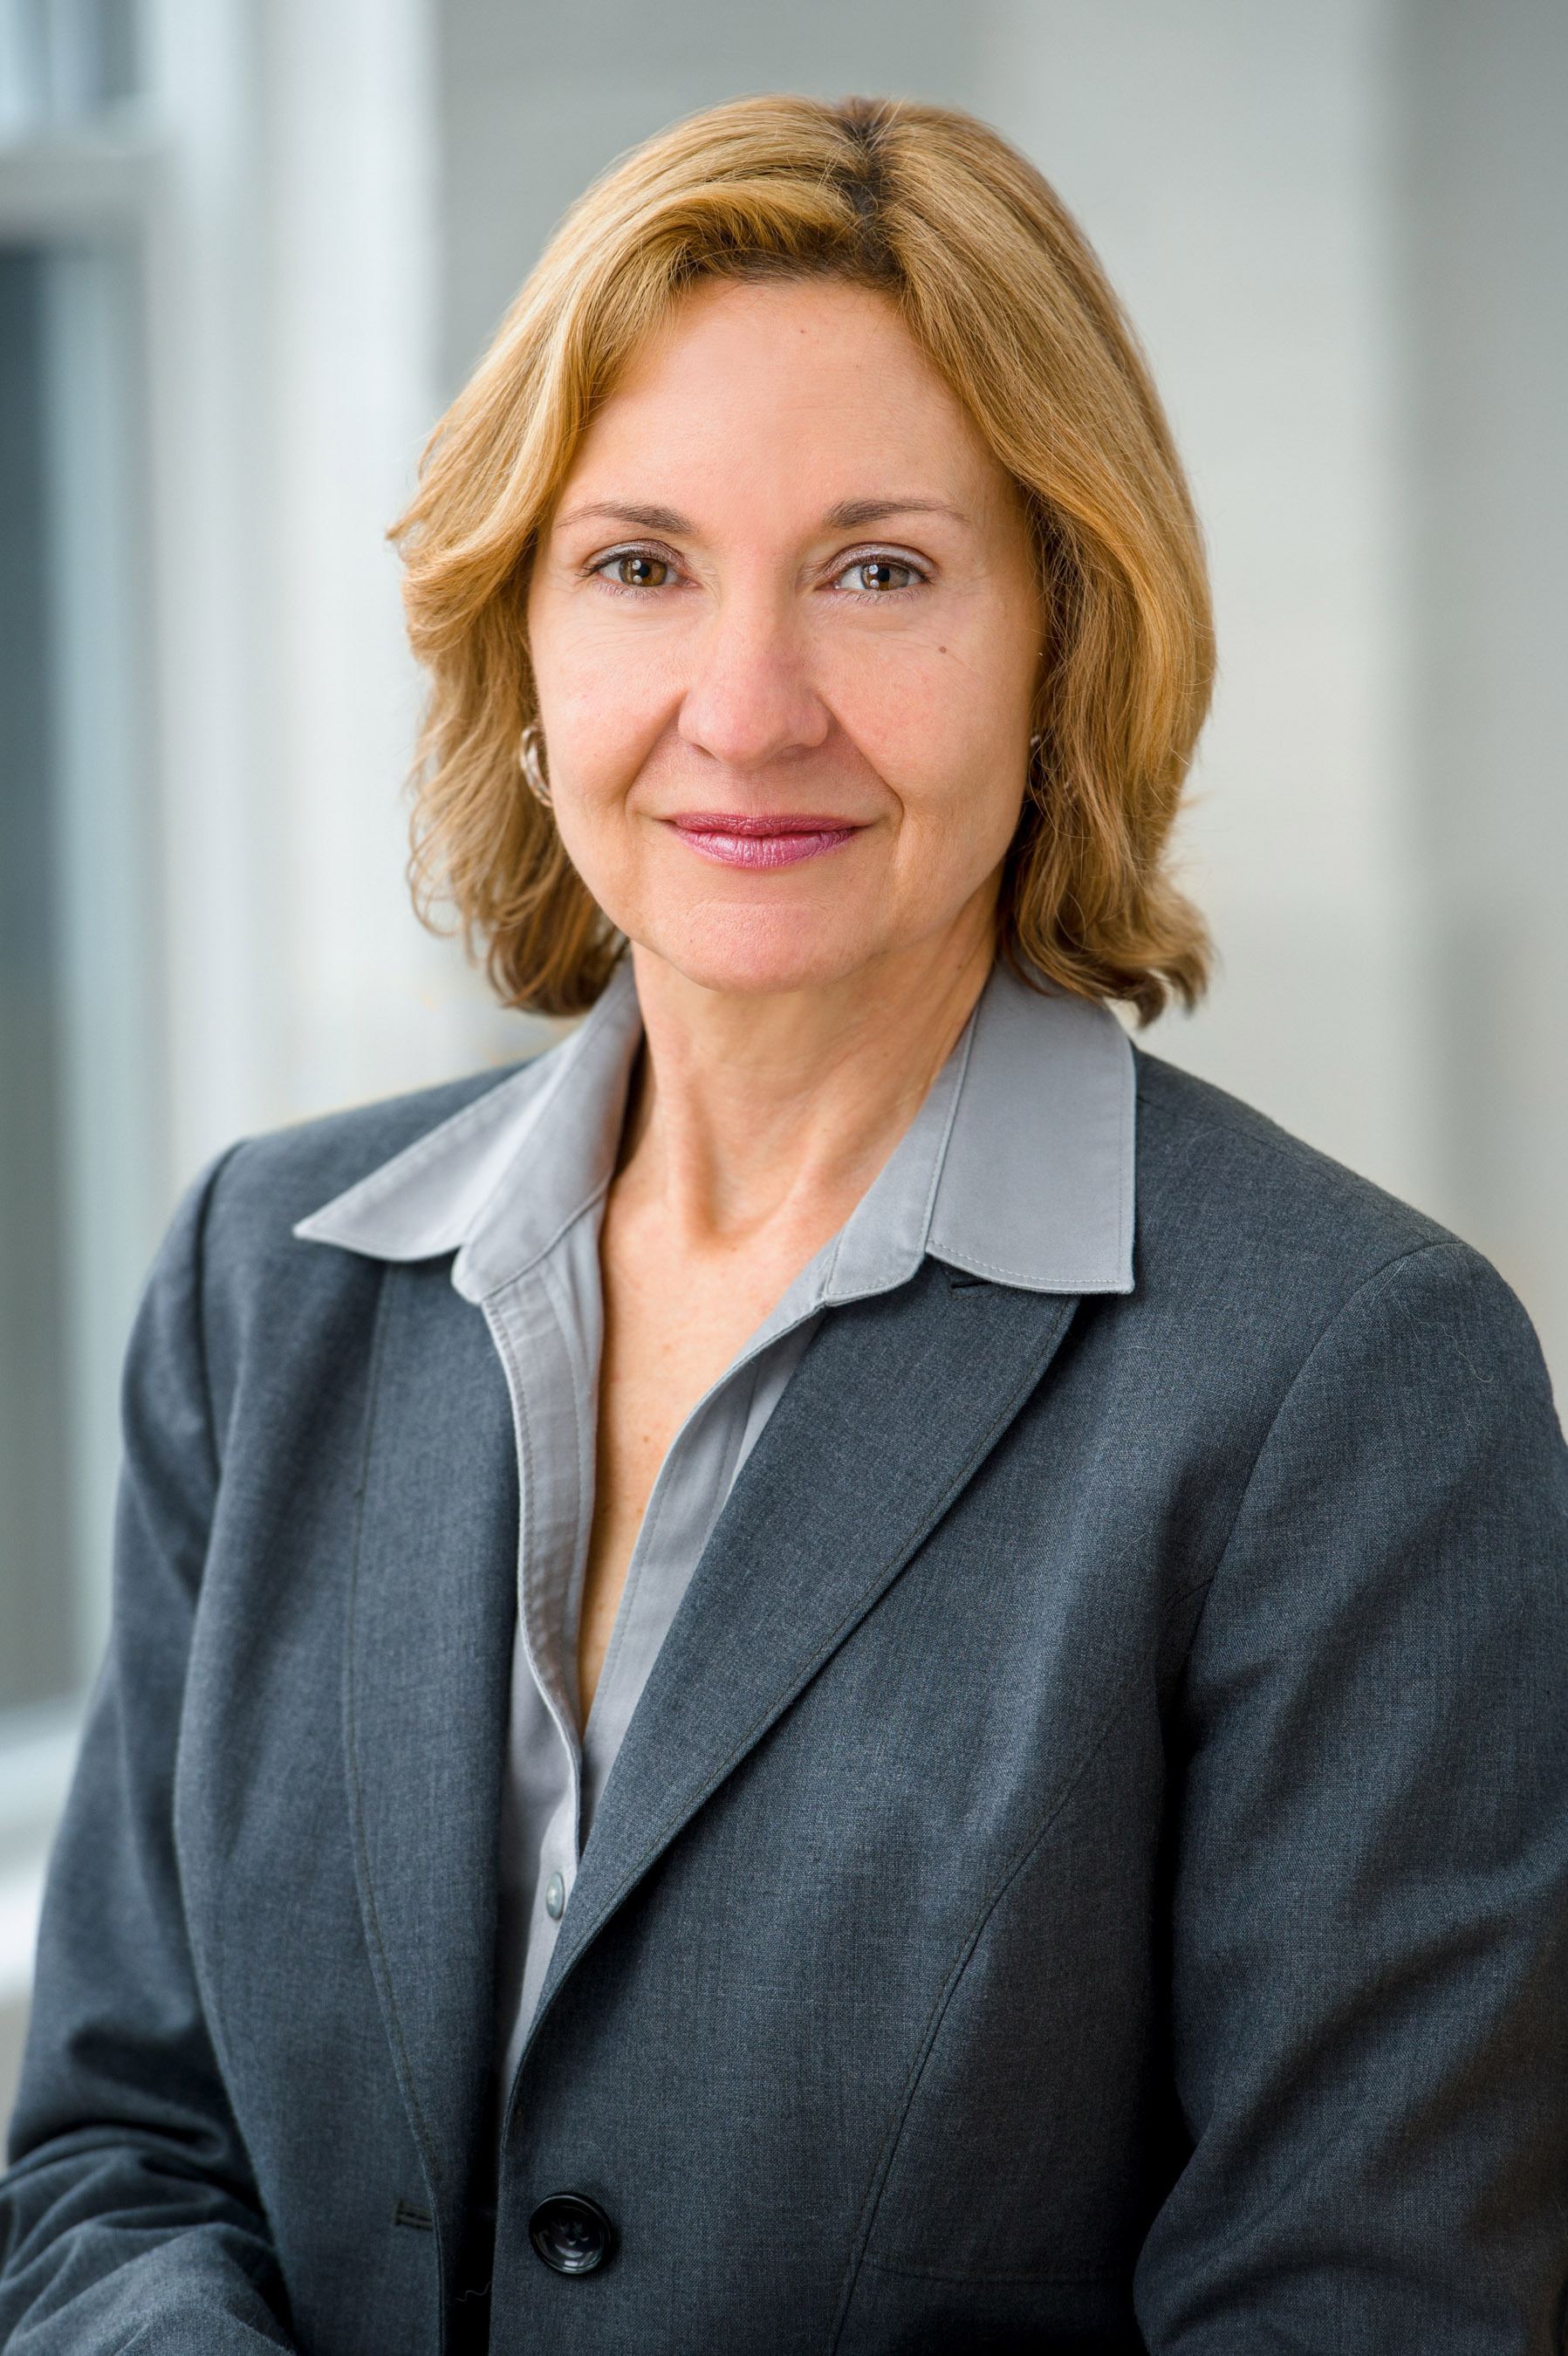 Pamela Rice Joins OnDeck as Senior Vice President of Technology. (PRNewsFoto/OnDeck) (PRNewsFoto/ONDECK)